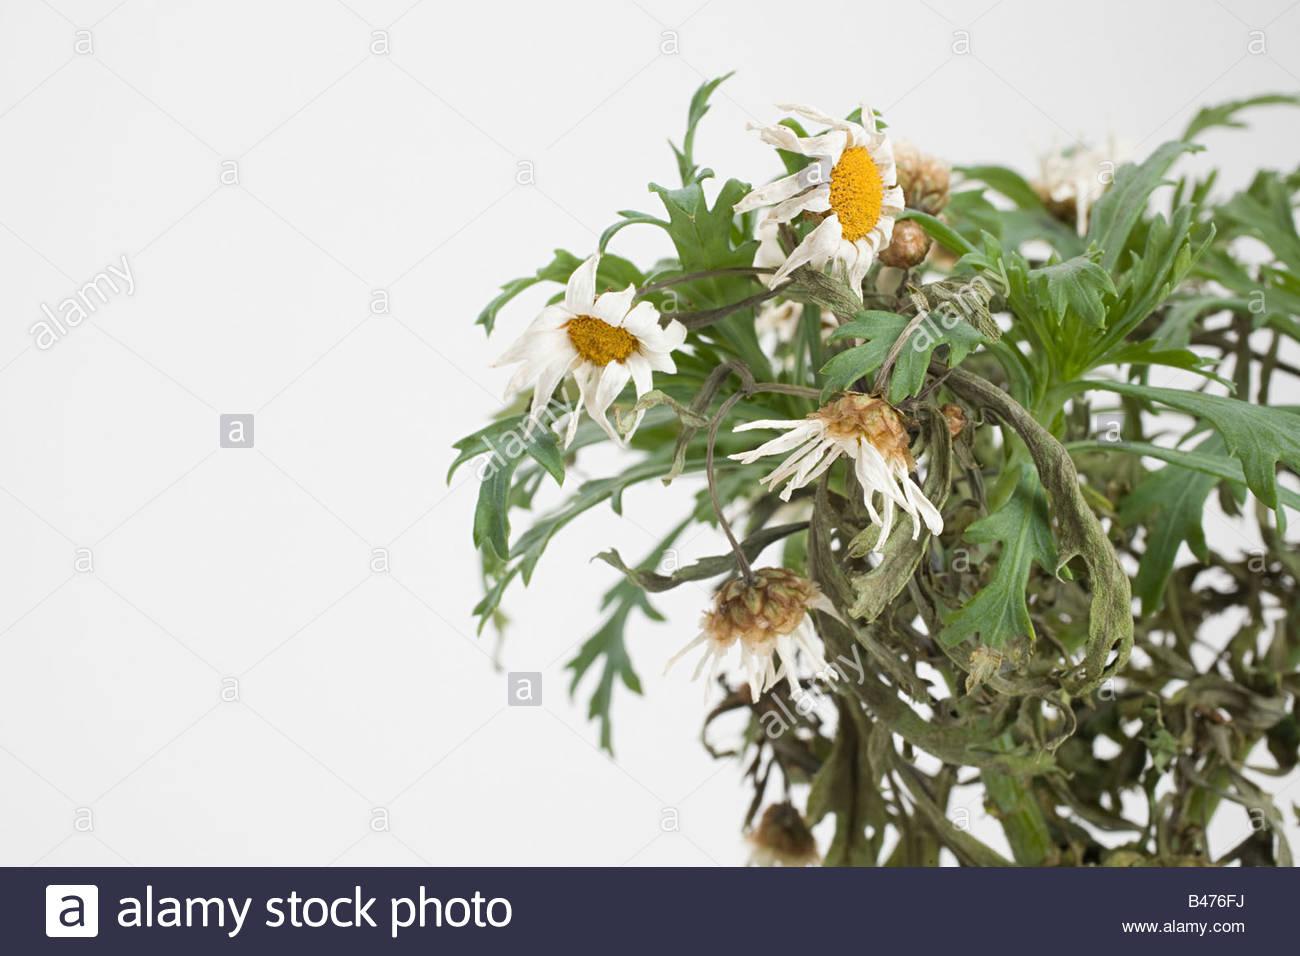 Dead daisies - Stock Image